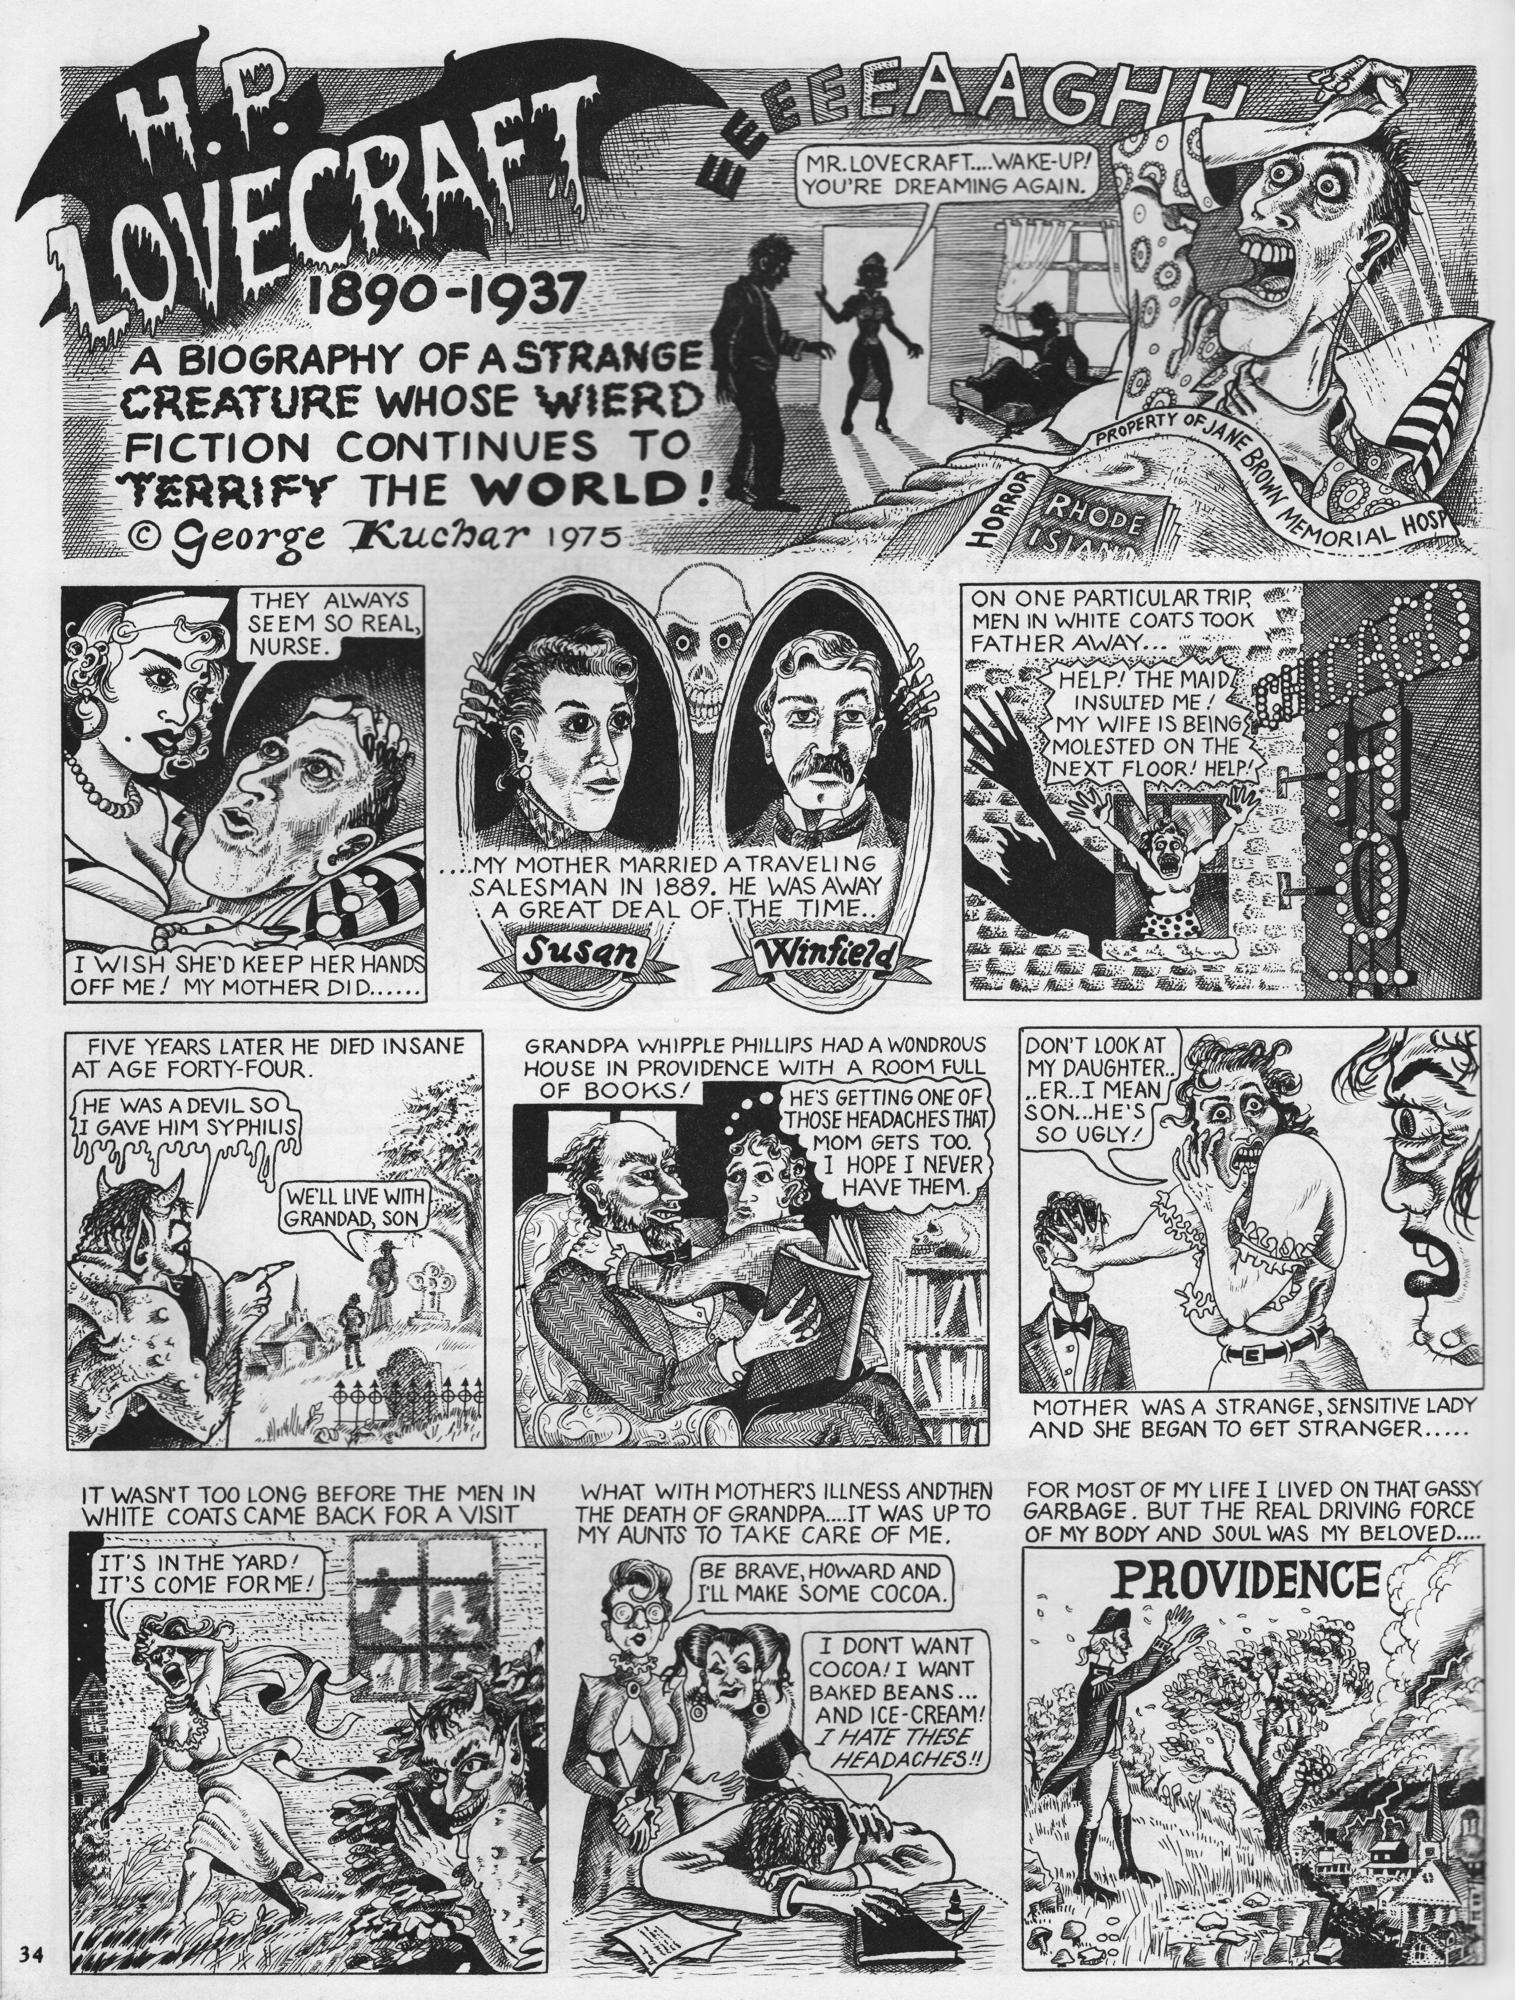 George Kuchar,  H.P. Lovecraft , 1975, ink on paper, Arcade, The Comics Revue No. 3, © Kuchar Brothers Trust.